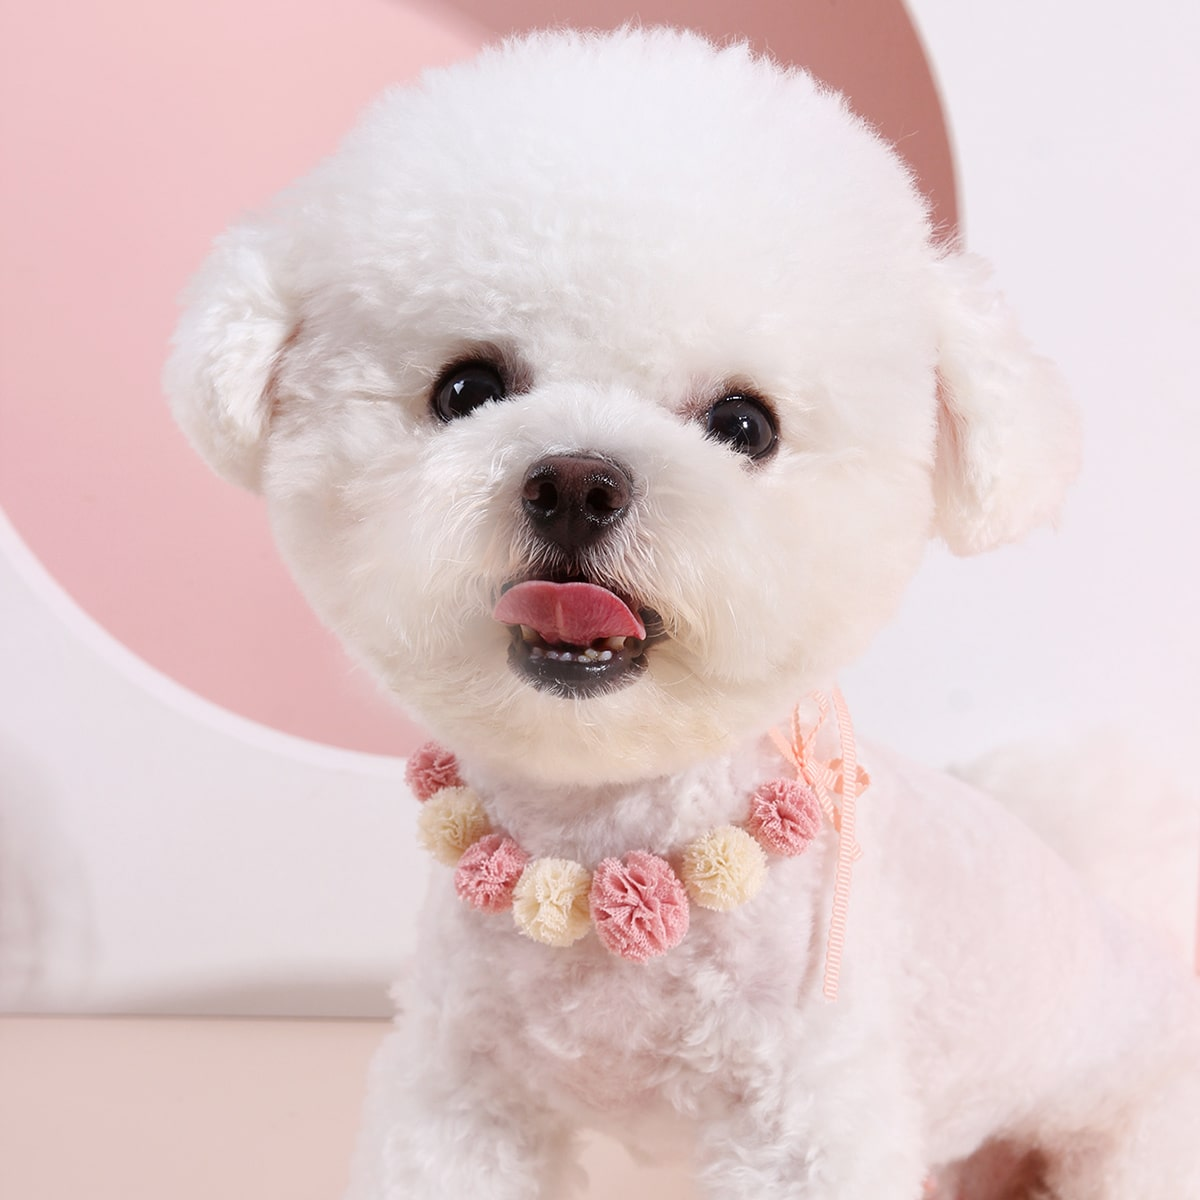 1 Stück Hund Halskette mit Pom-pom Dekor